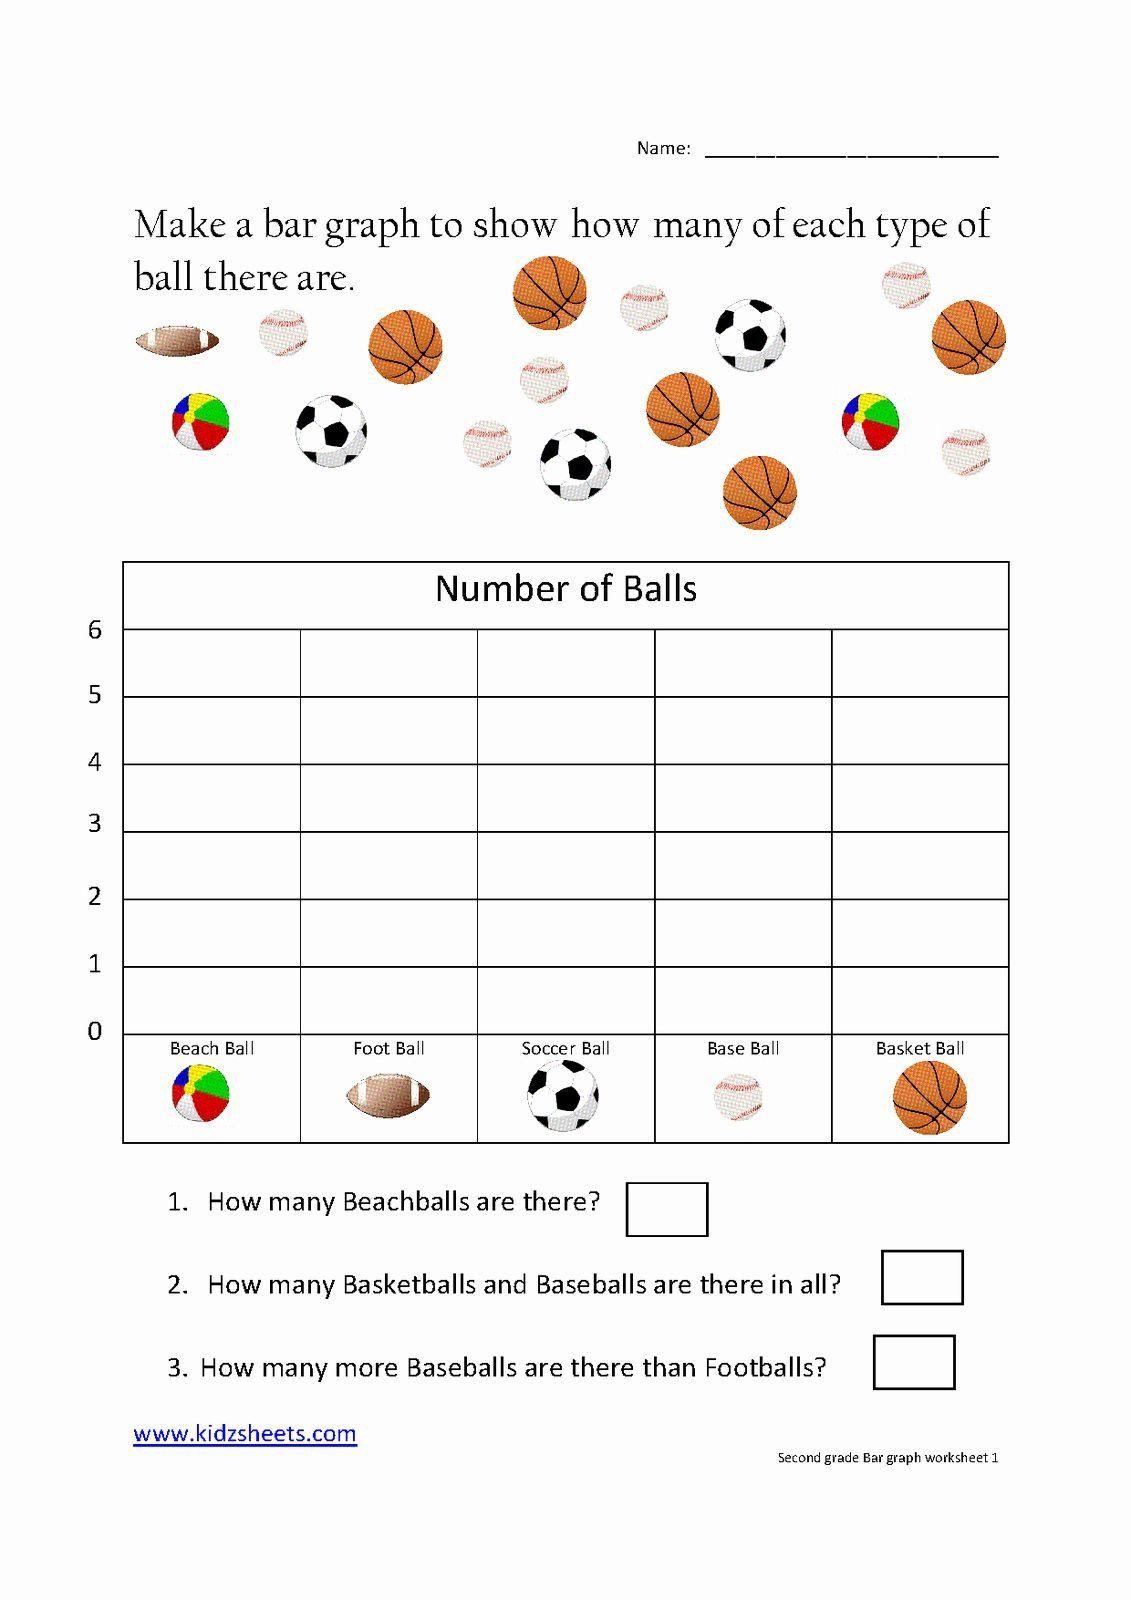 Pictograph Worksheets For Kindergarten 30 Free Bar Graph